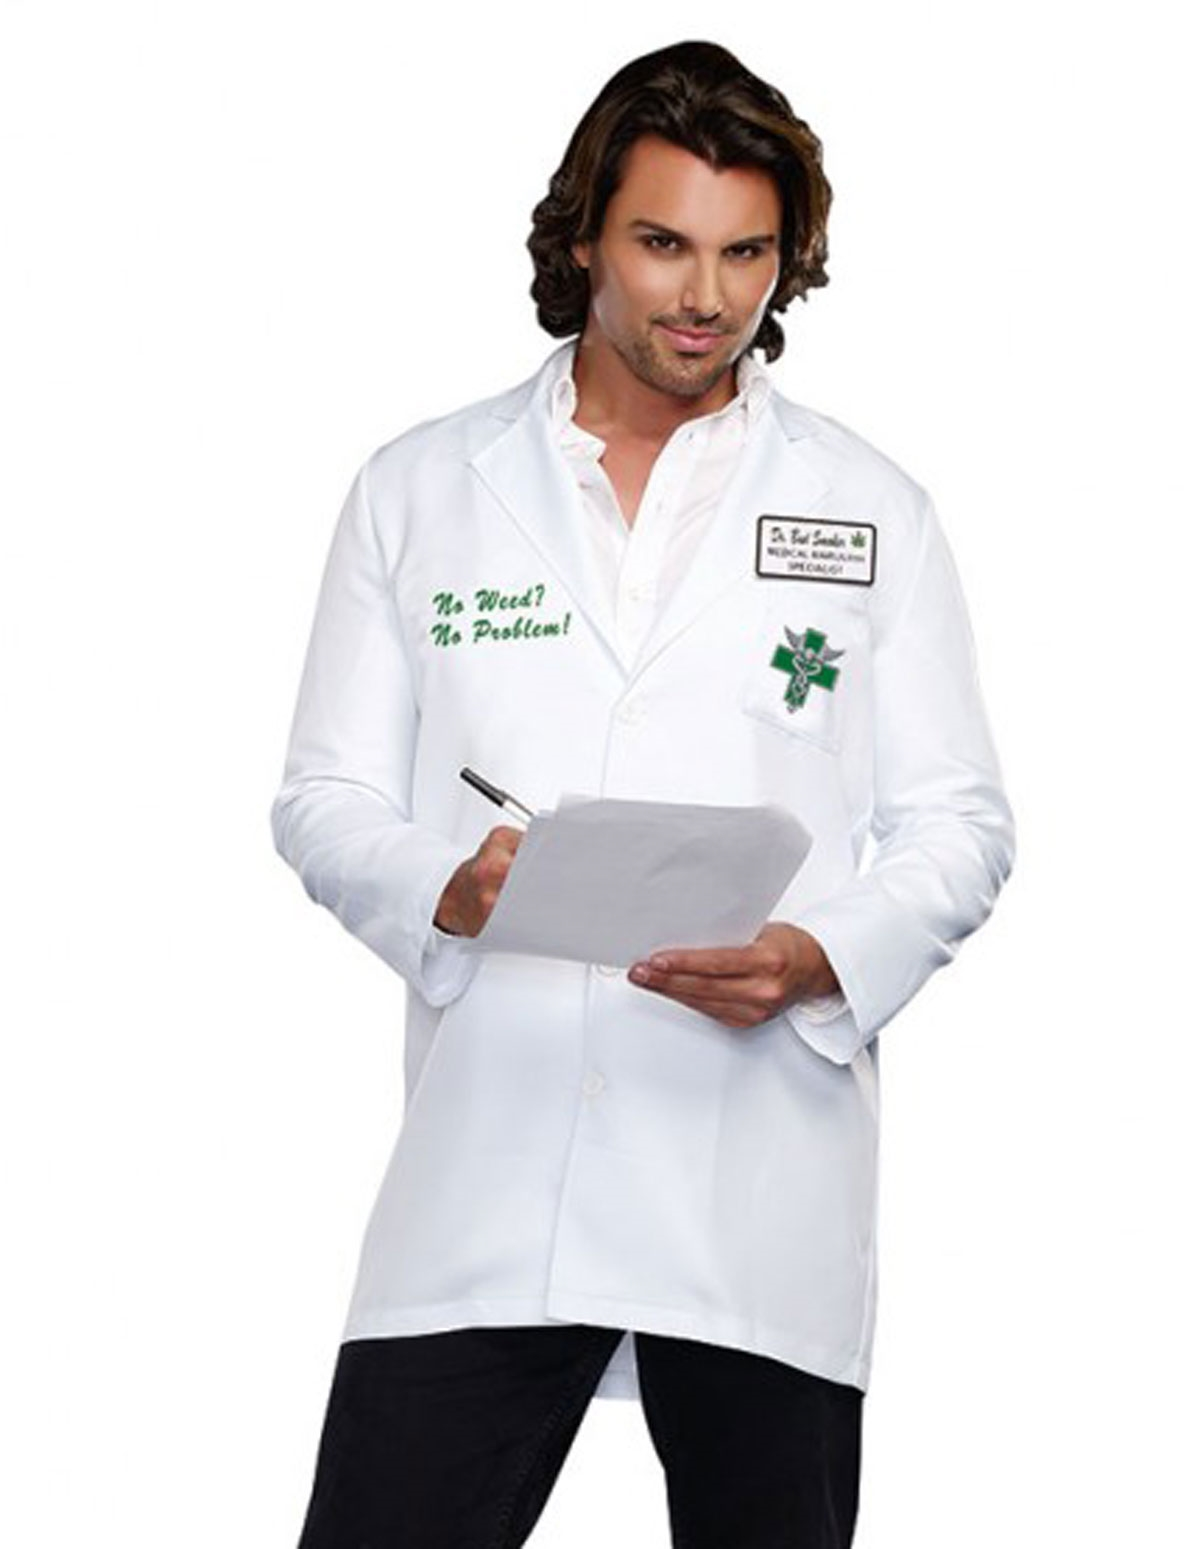 Dr. Bud Smoker Costume